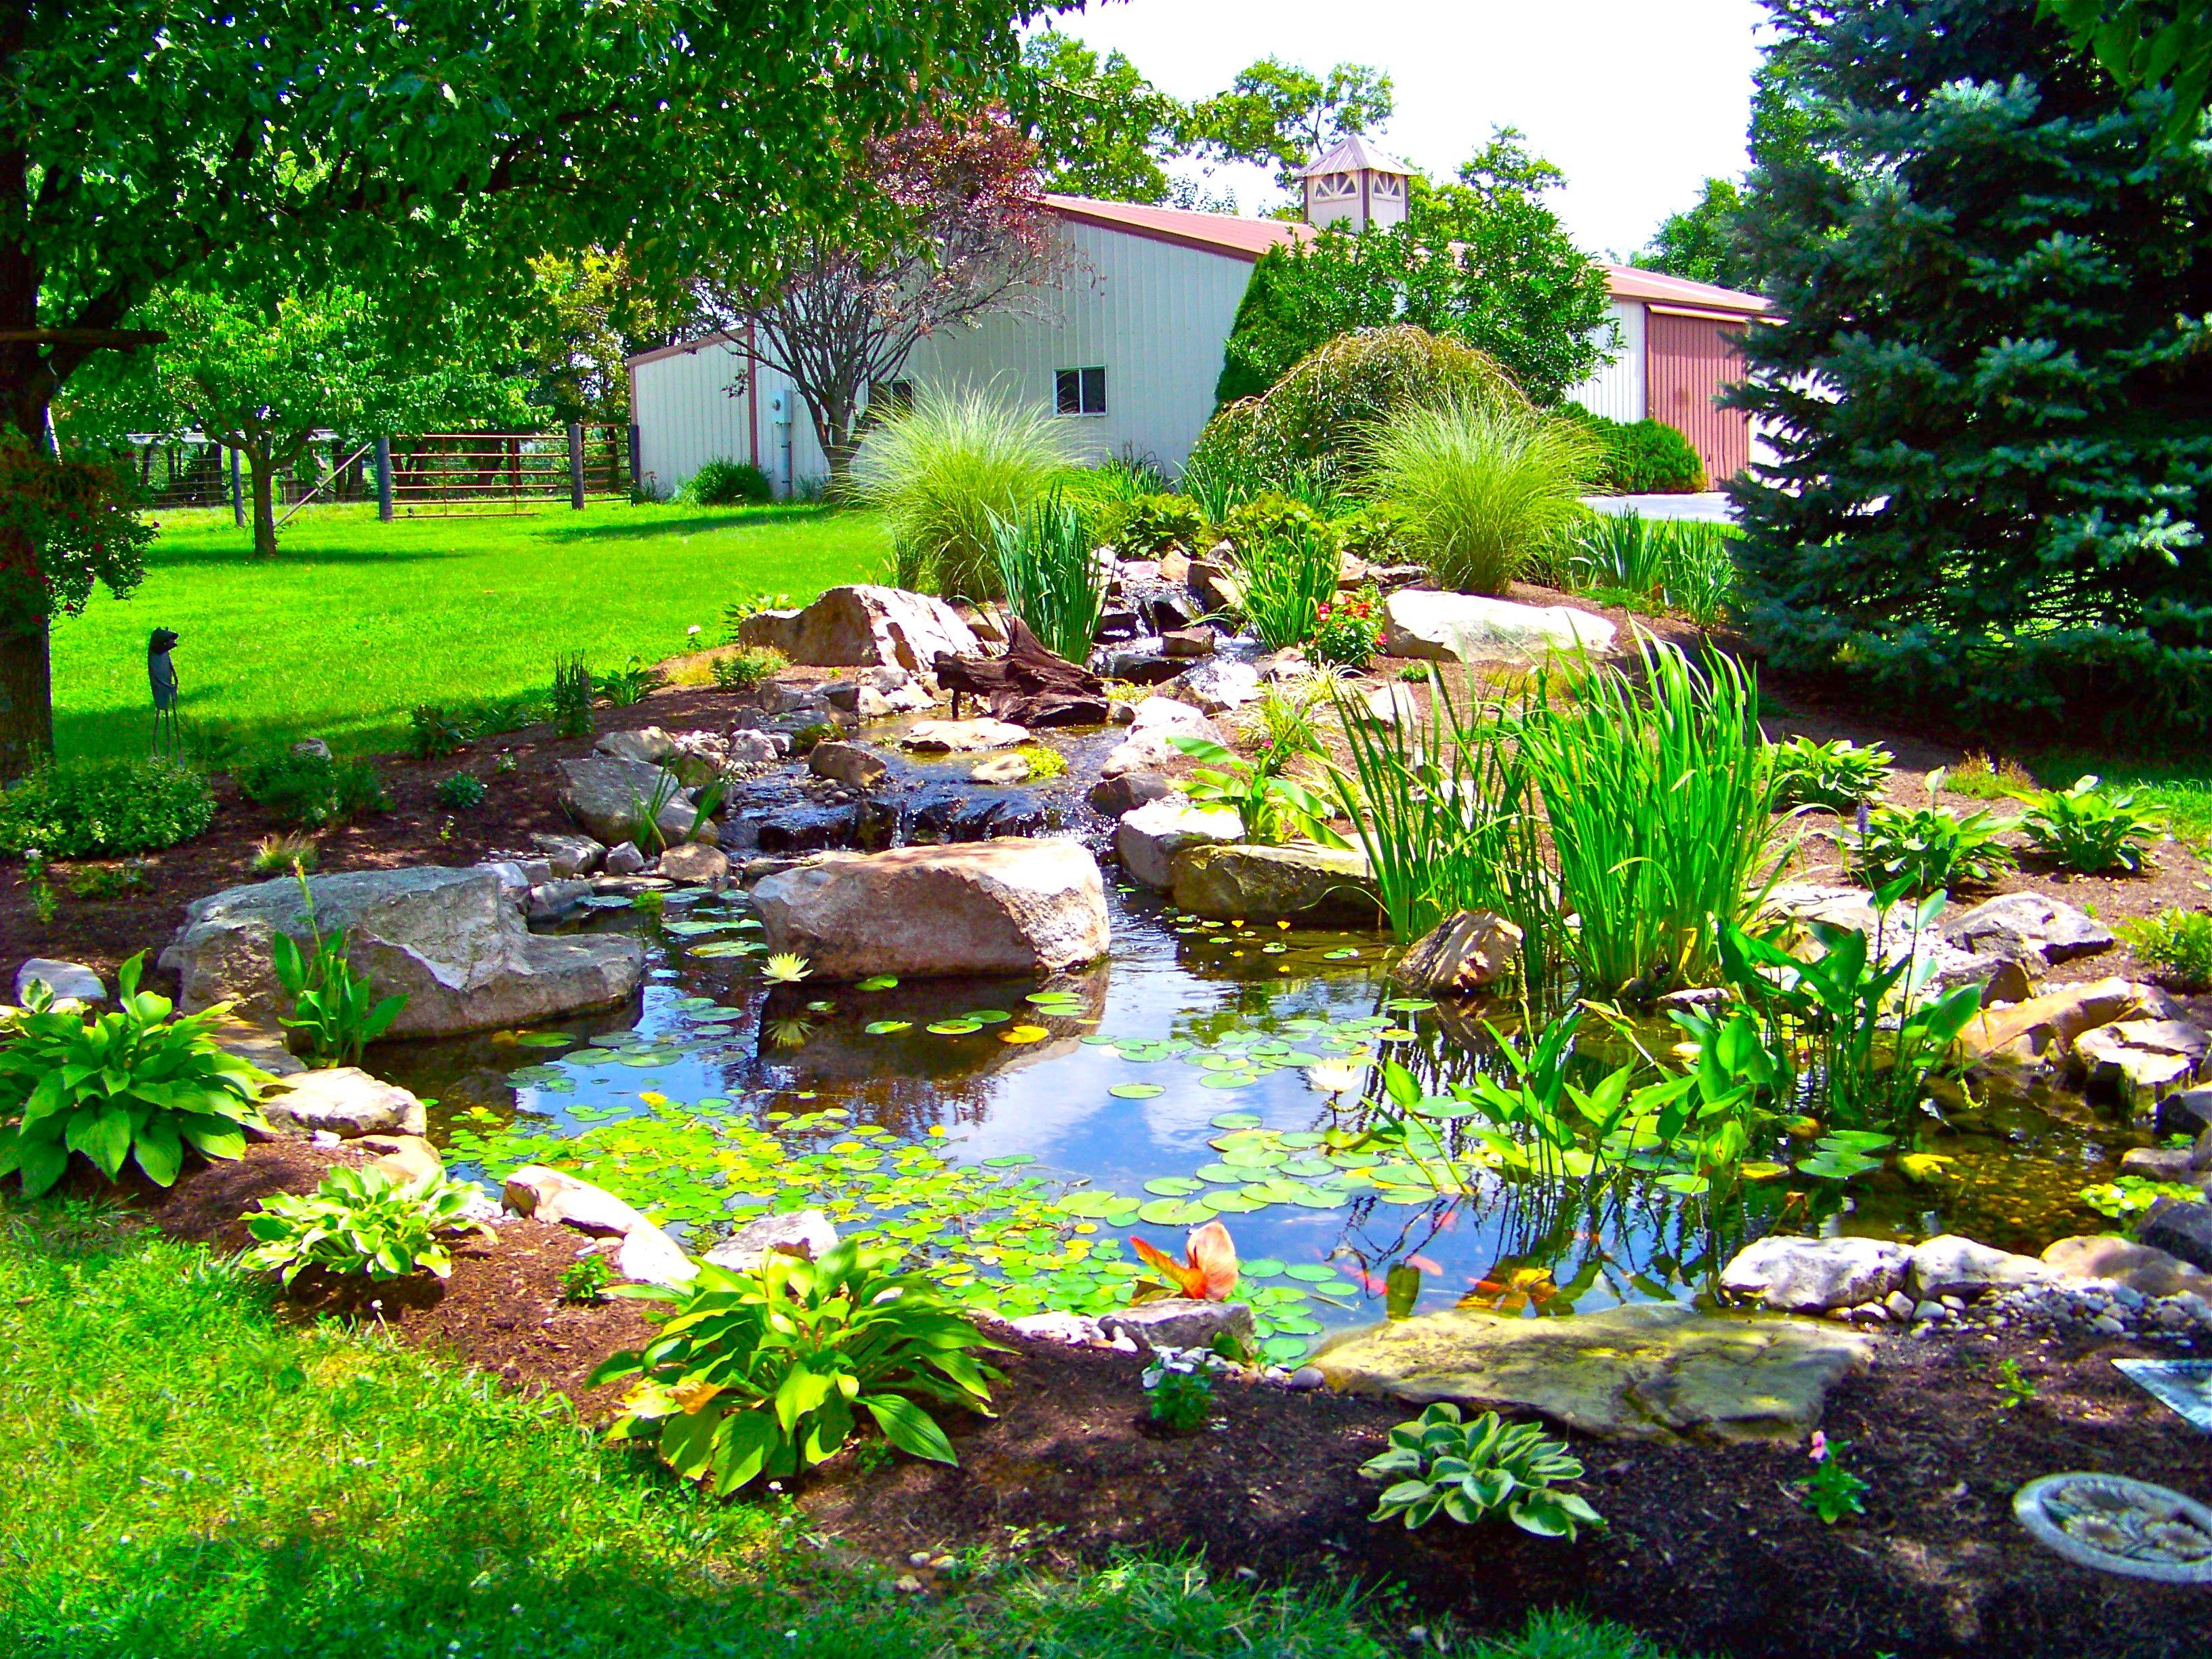 Custom Water Gardens In Lexington Ky American Deck Sunroom Water Features In The Garden Beautiful Backyards Backyard